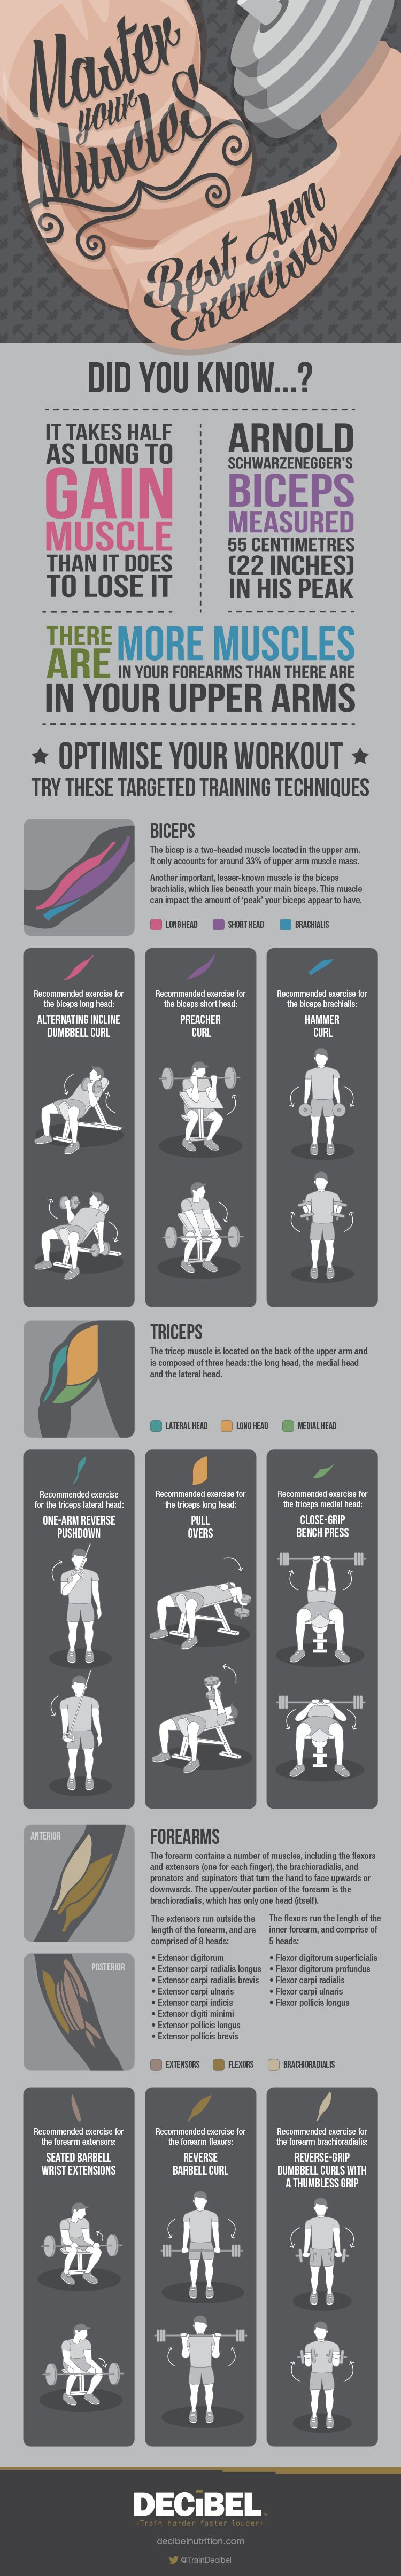 Best Arm Exercises Infographic